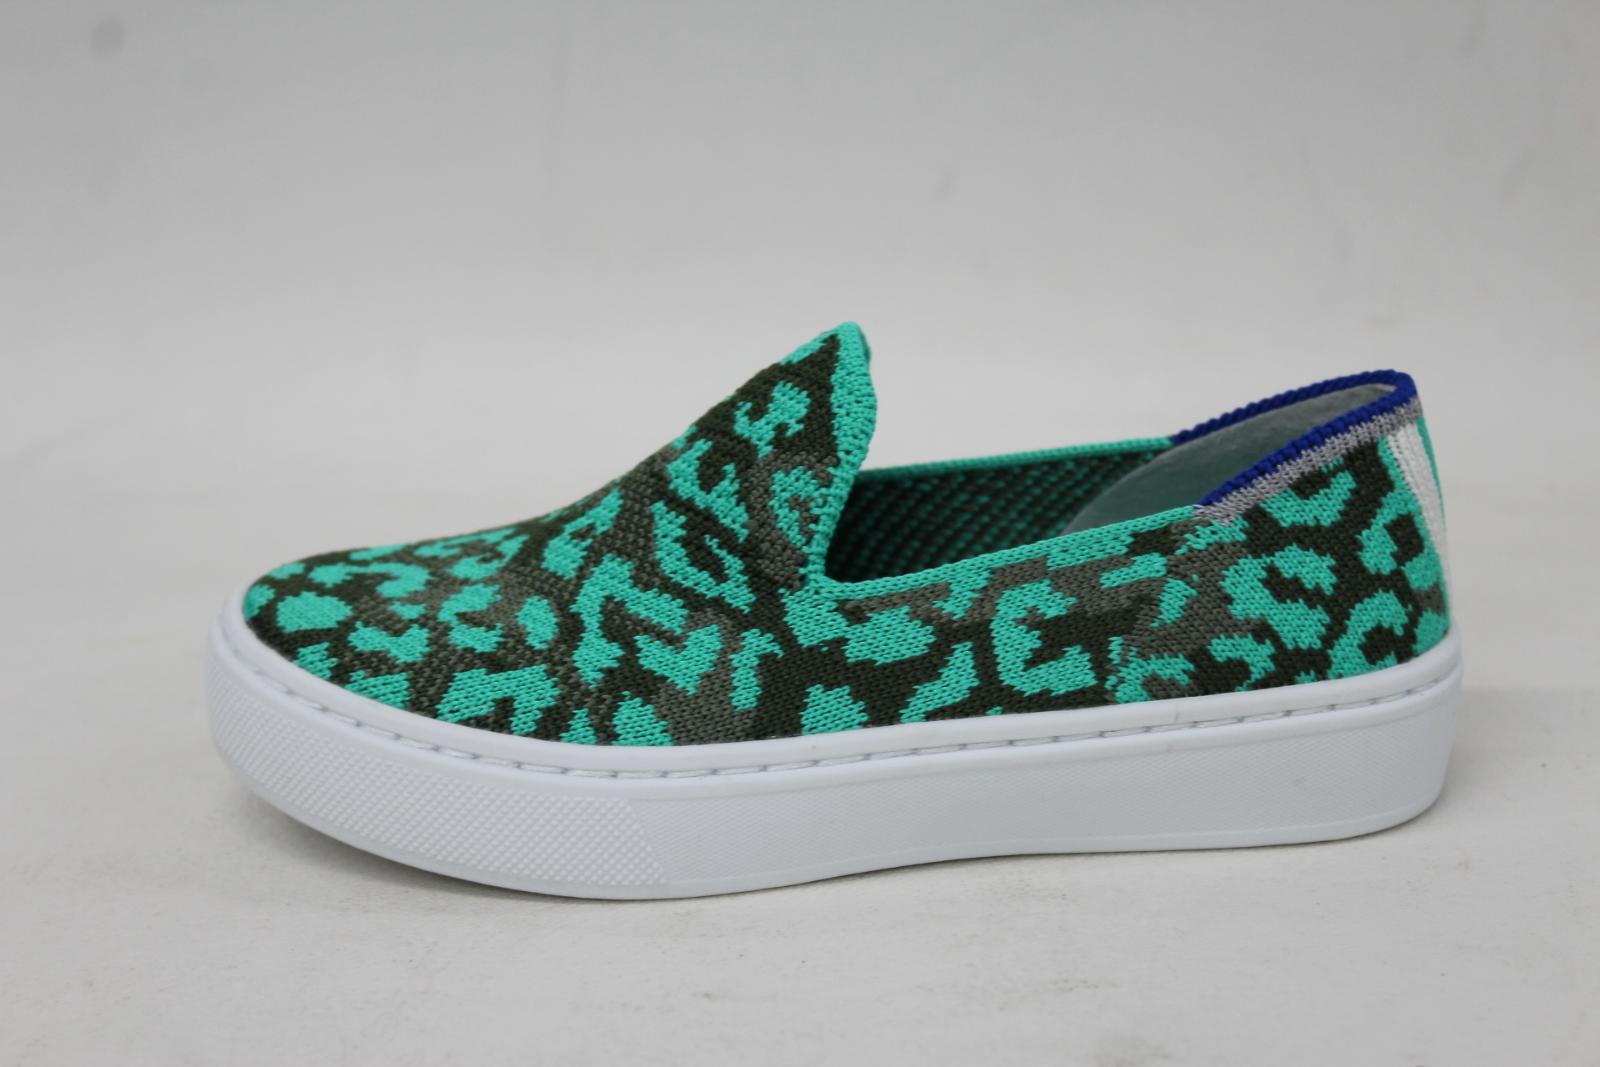 ROTHY'S Girls The Kids Sneaker Aqua Camo Spot Textile Shoes US10 UK9 BNIB 6